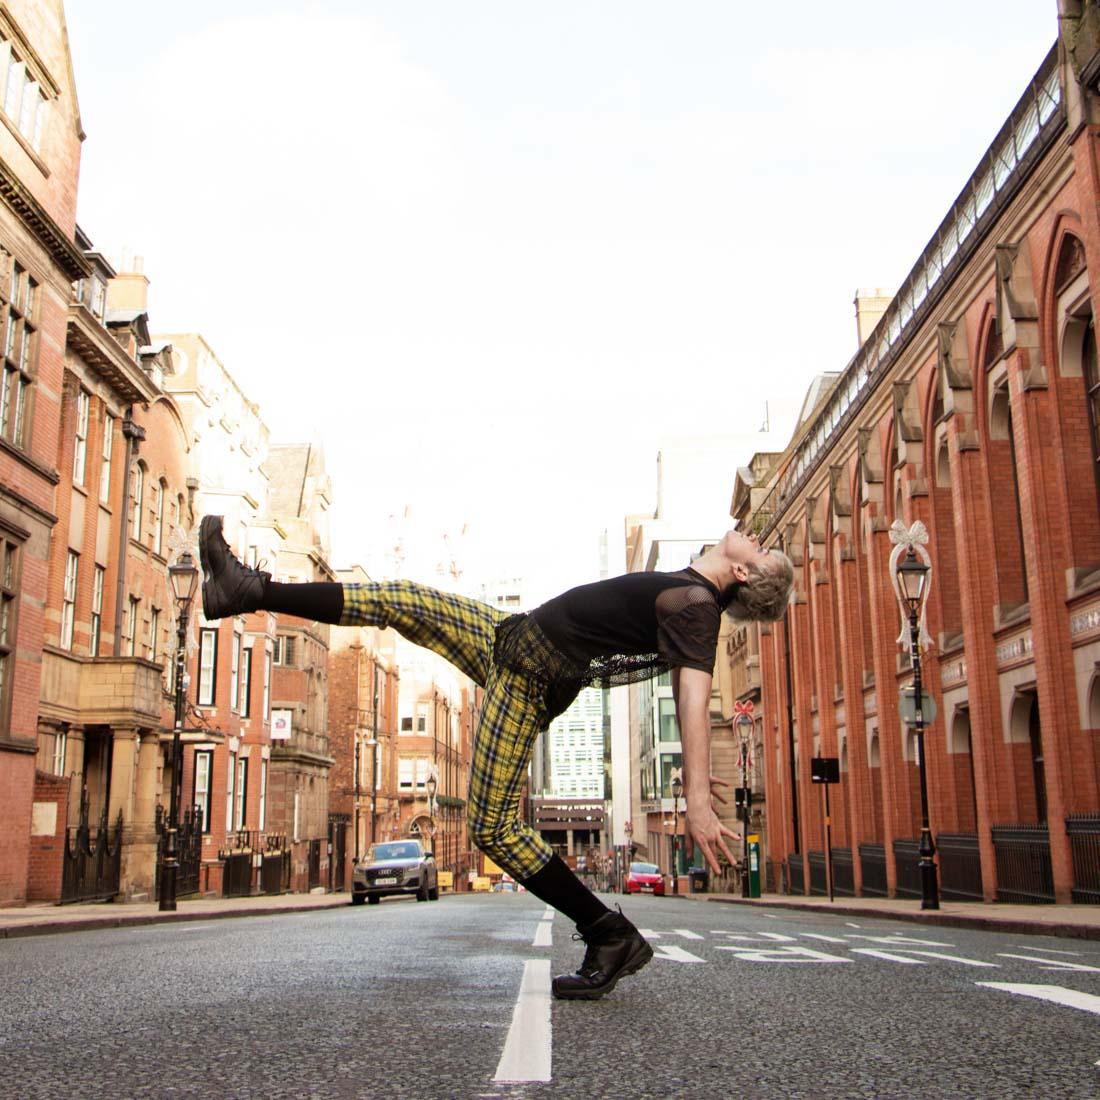 Birmingham U.K. dance photography. Male dancer dancing in the street